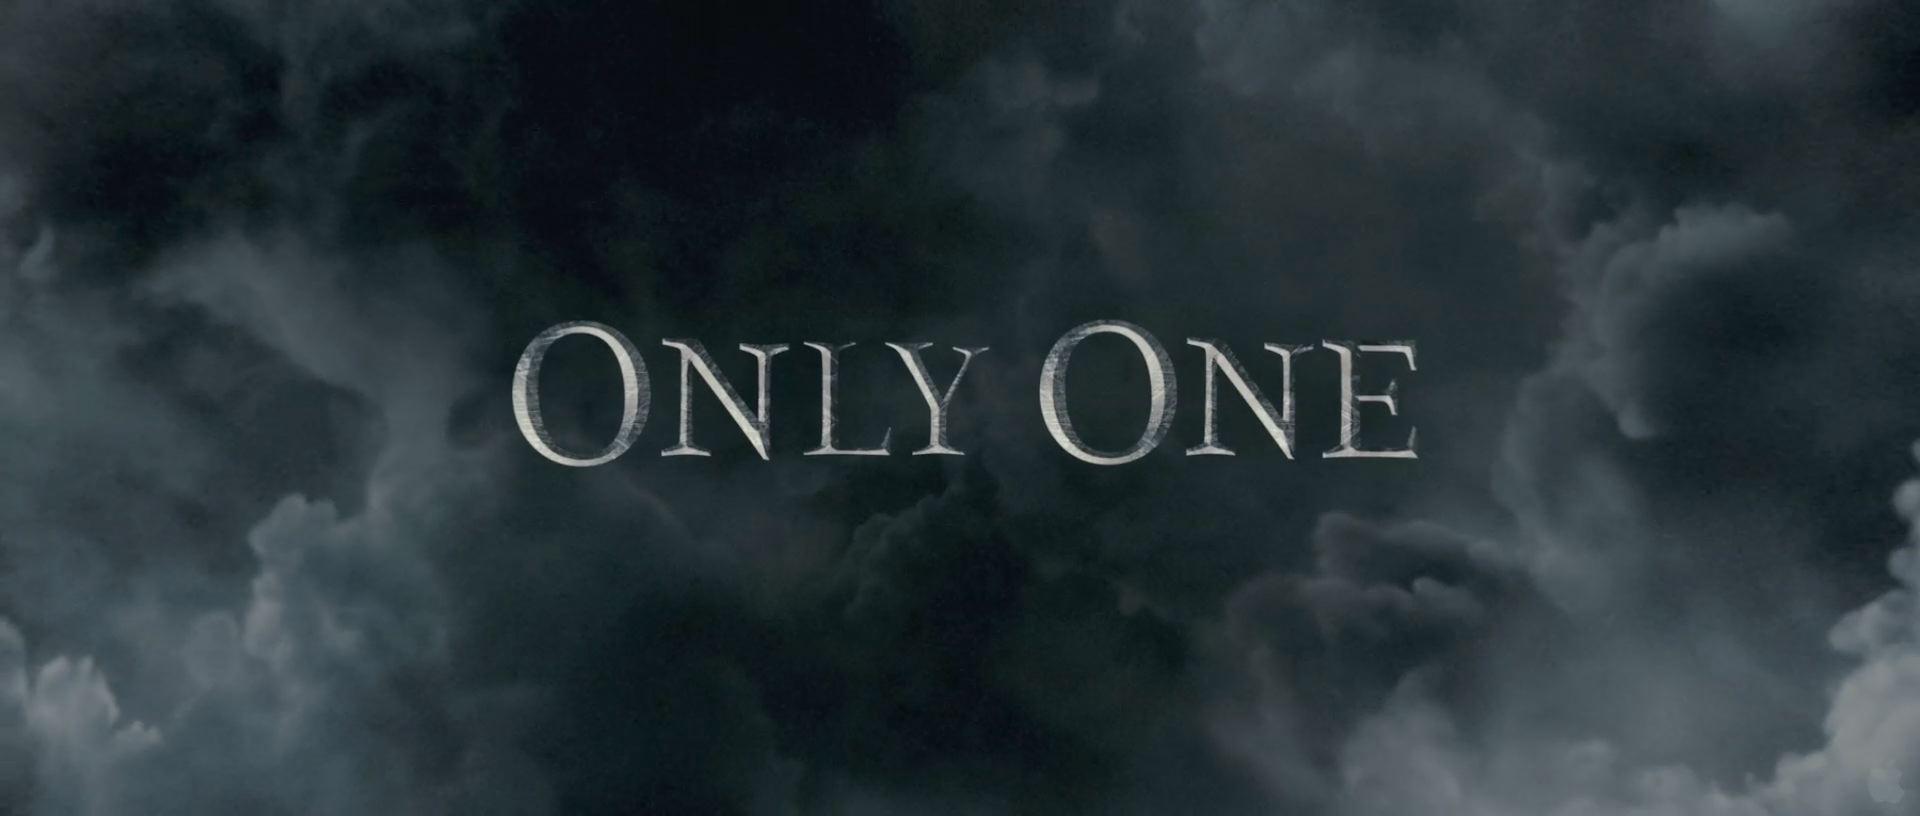 Harry Potter BlogHogwarts HP7 2 Trailer 28